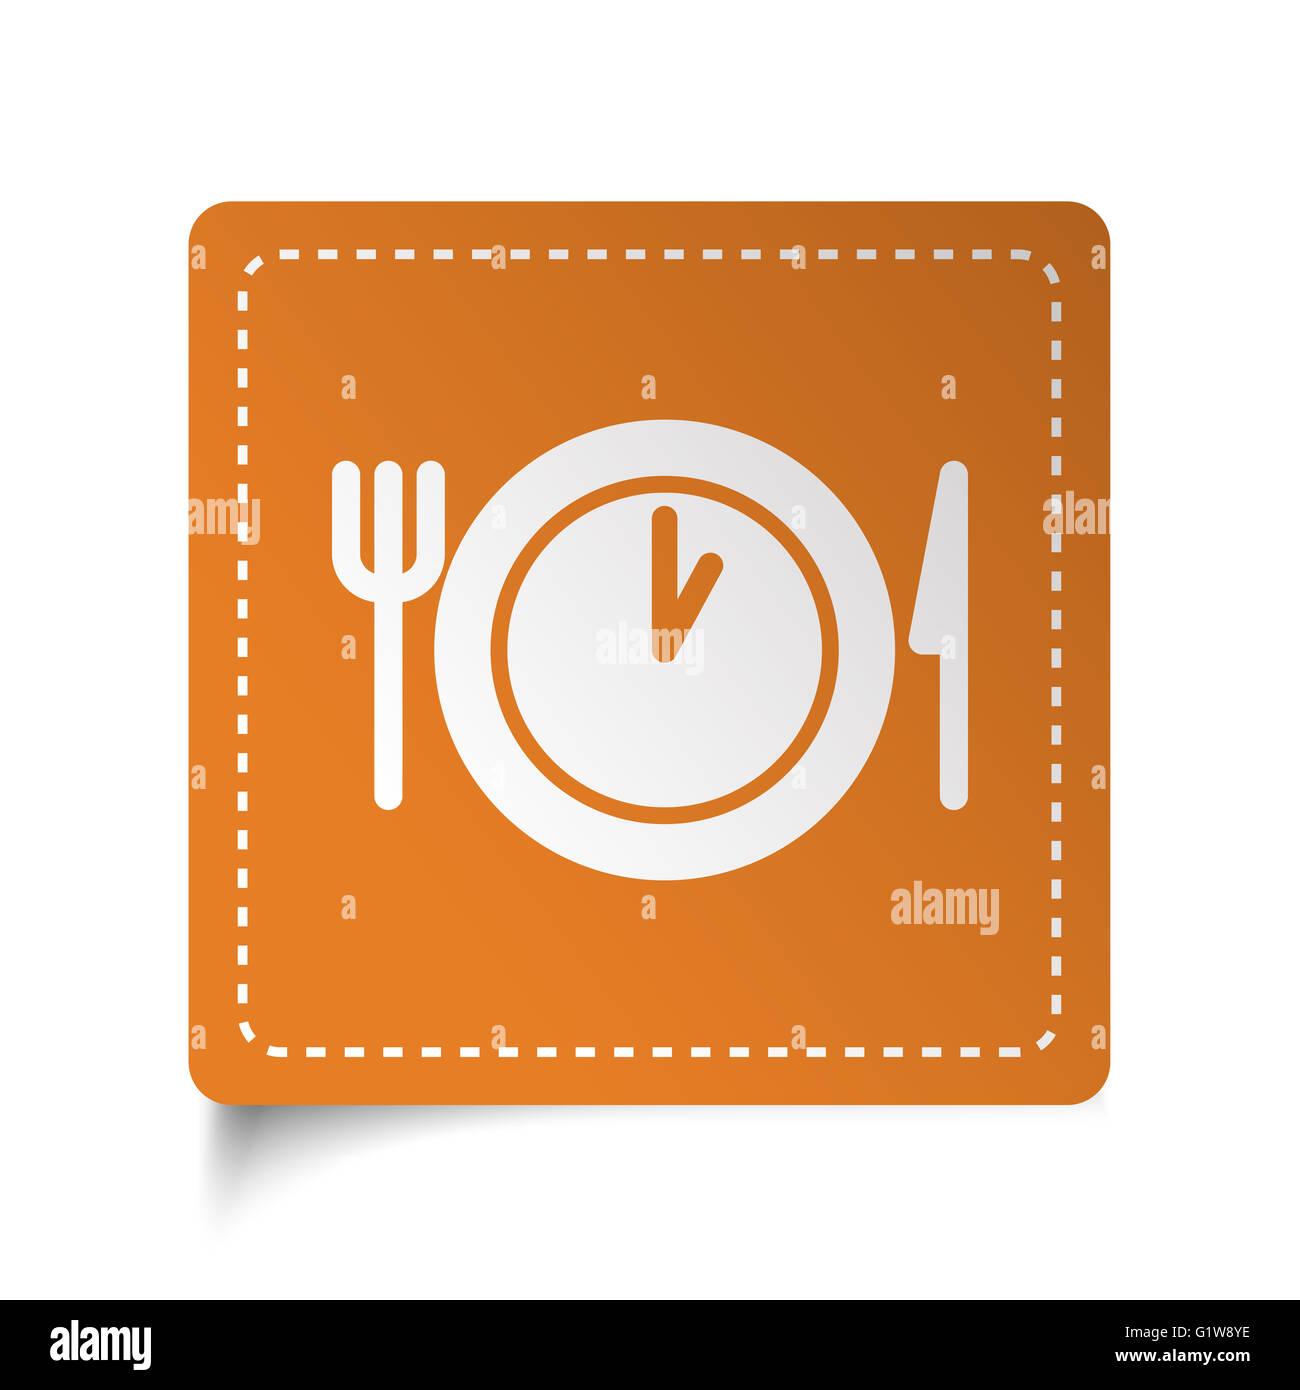 White Flat Lunch Time Icon On Orange Sticker